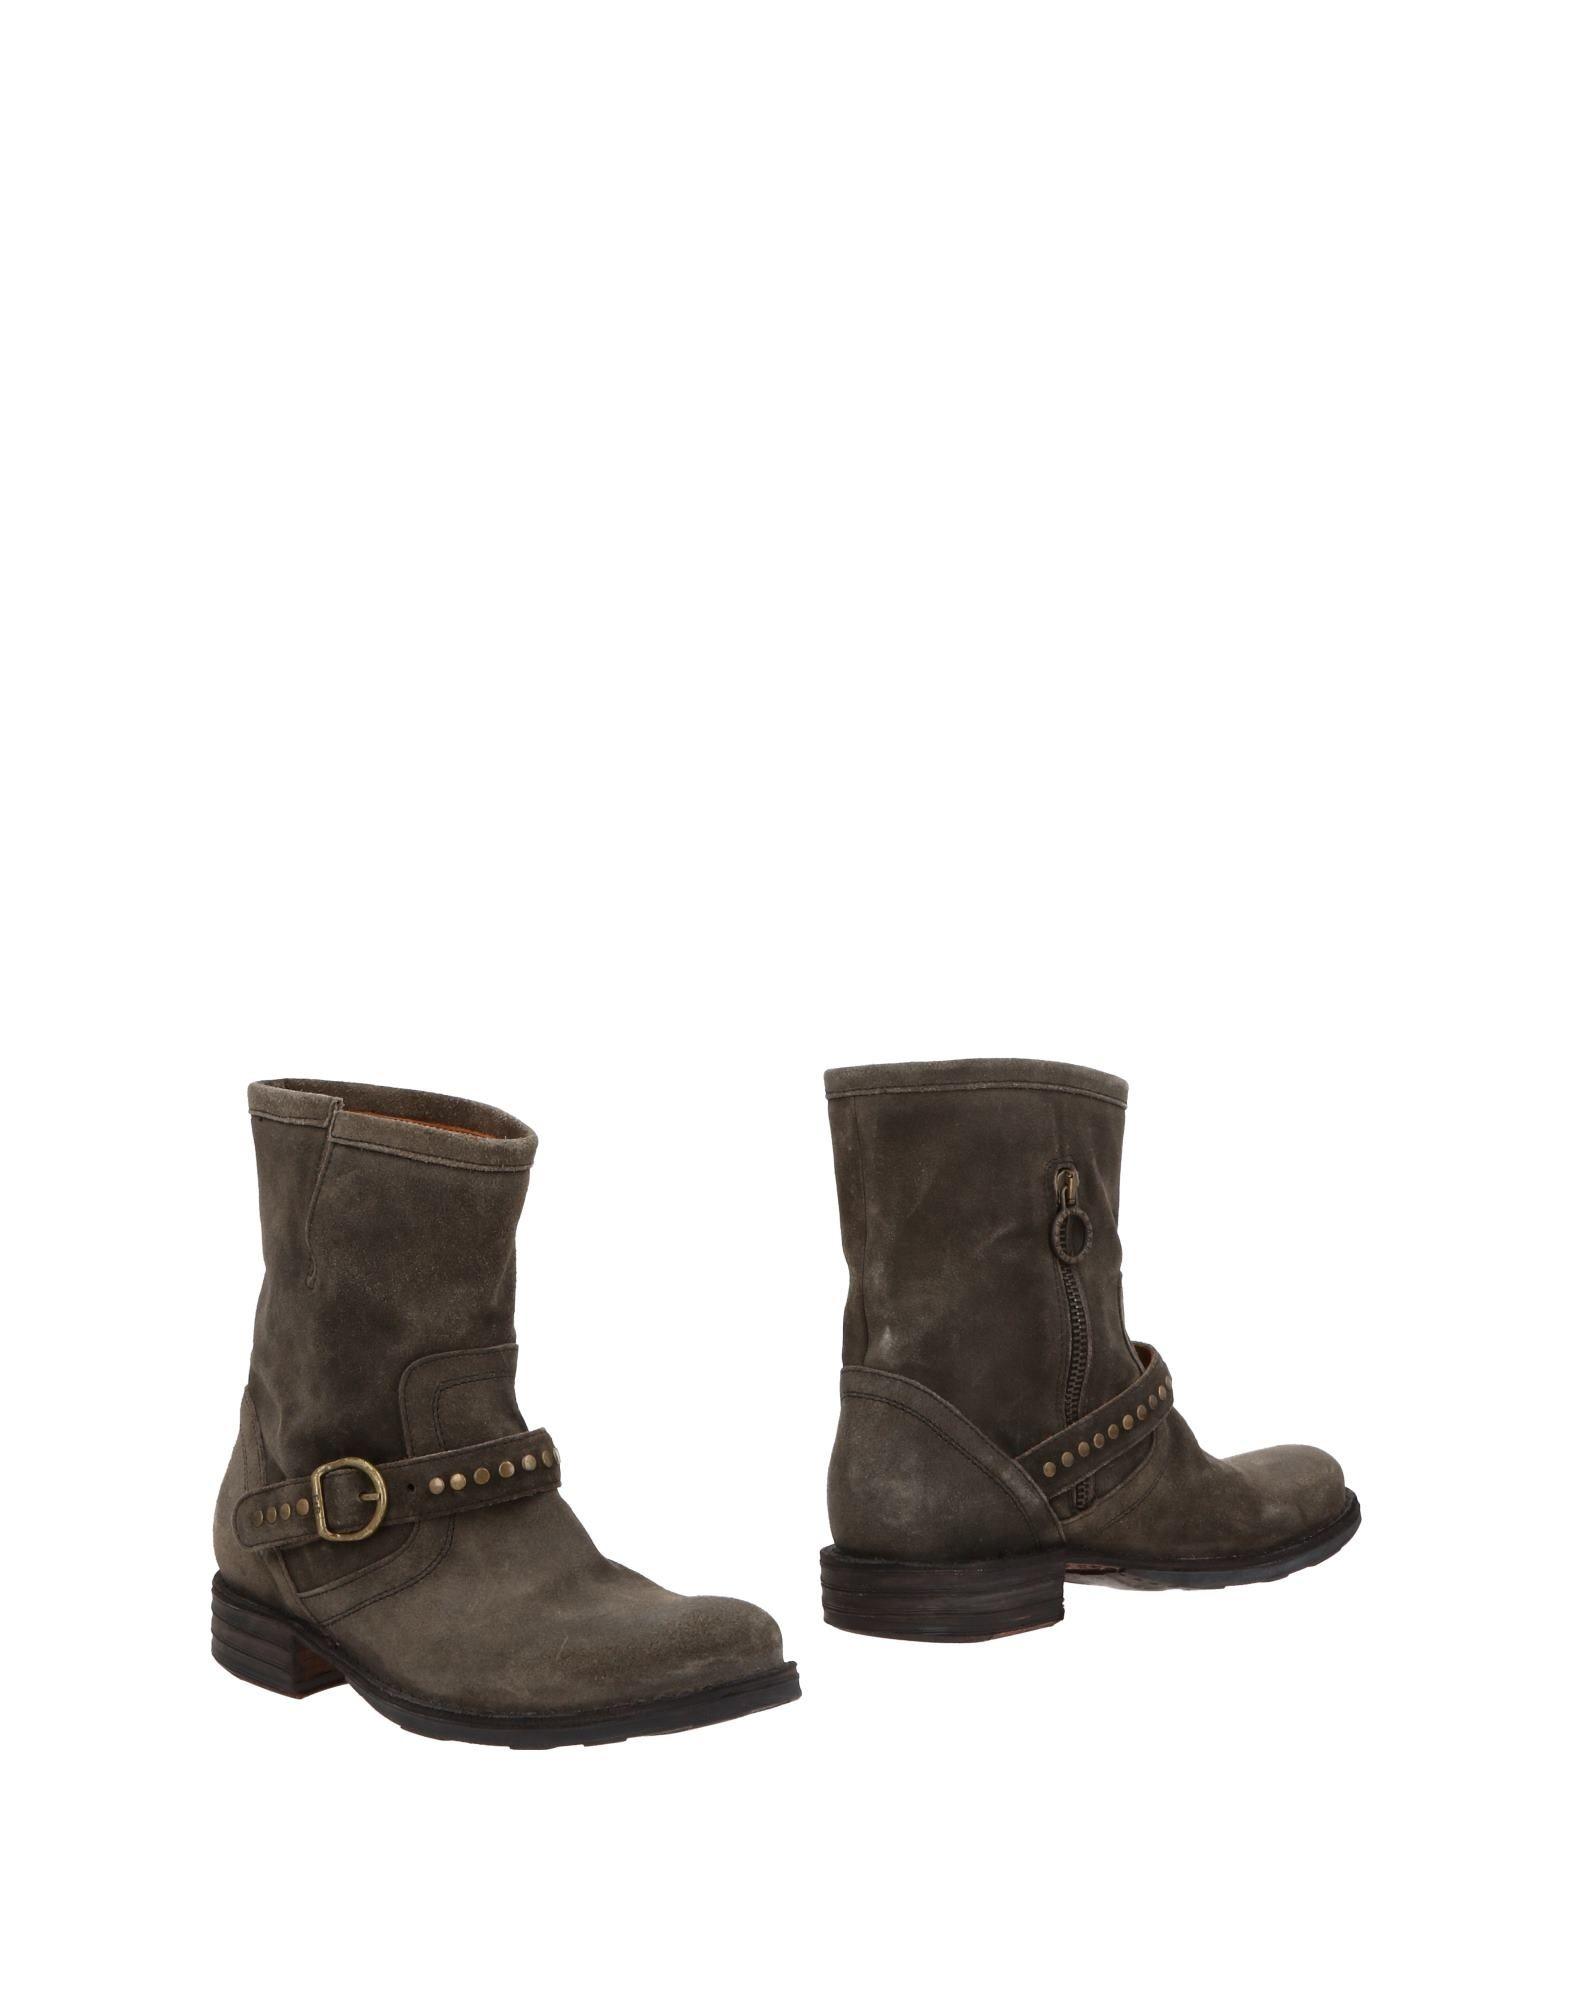 Fiorentini+Baker Stiefelette Damen Schuhe  44595014SUGut aussehende strapazierfähige Schuhe Damen 782993